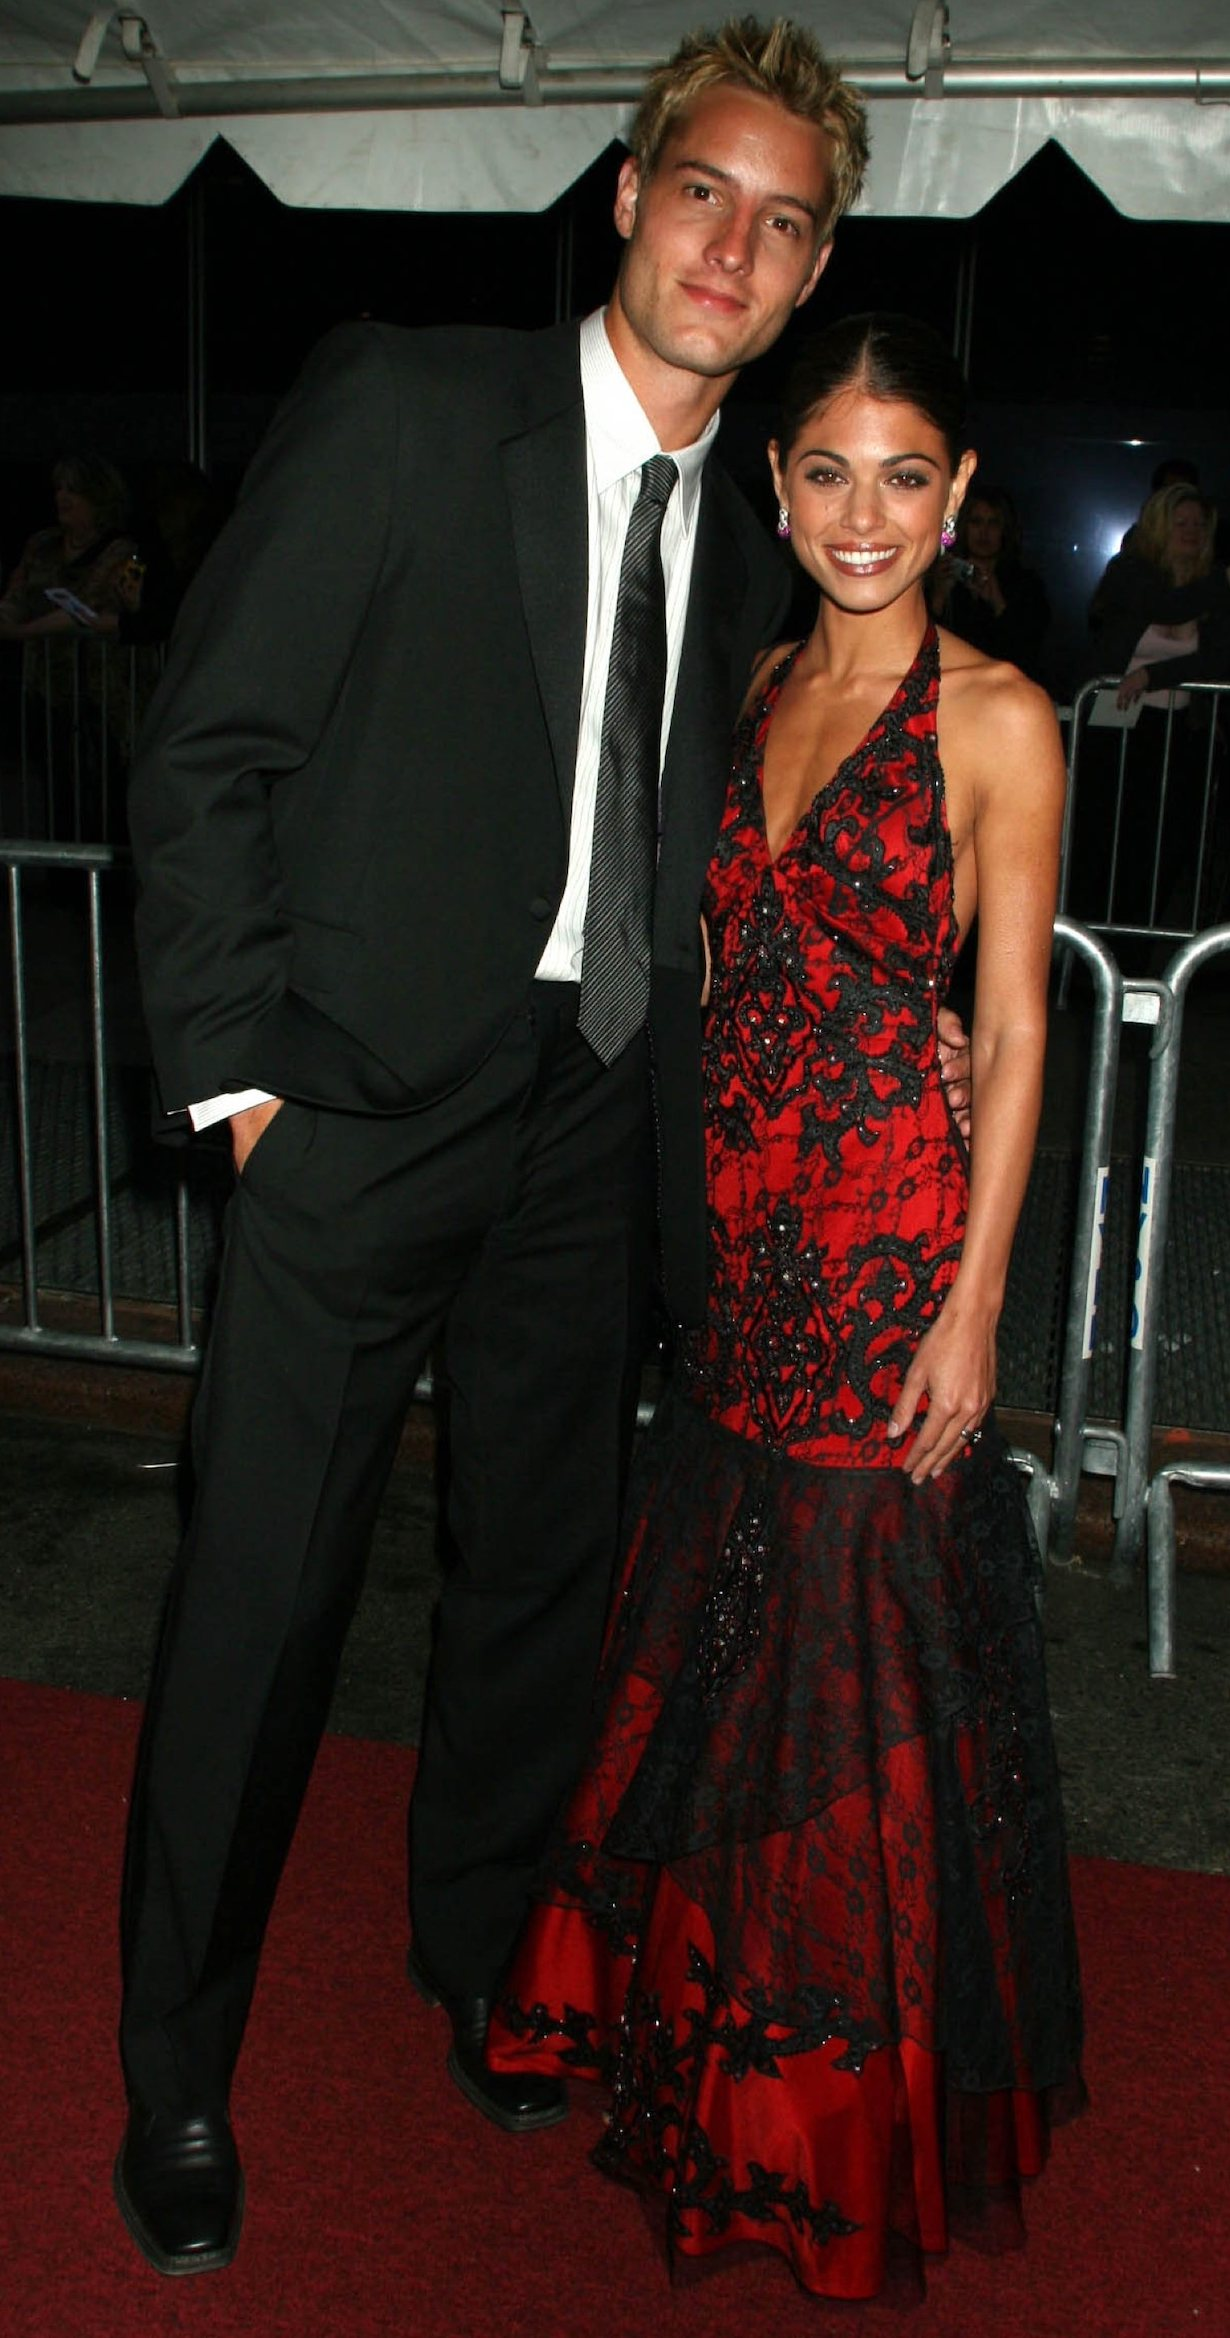 Lindsay Hartley, Justin Hartley 32nd Annual Daytime Emmy Awards - Arrivals Radio City Music Hall New York 5/20/05 �George De Sota/jpistudios.com 310-657-9661